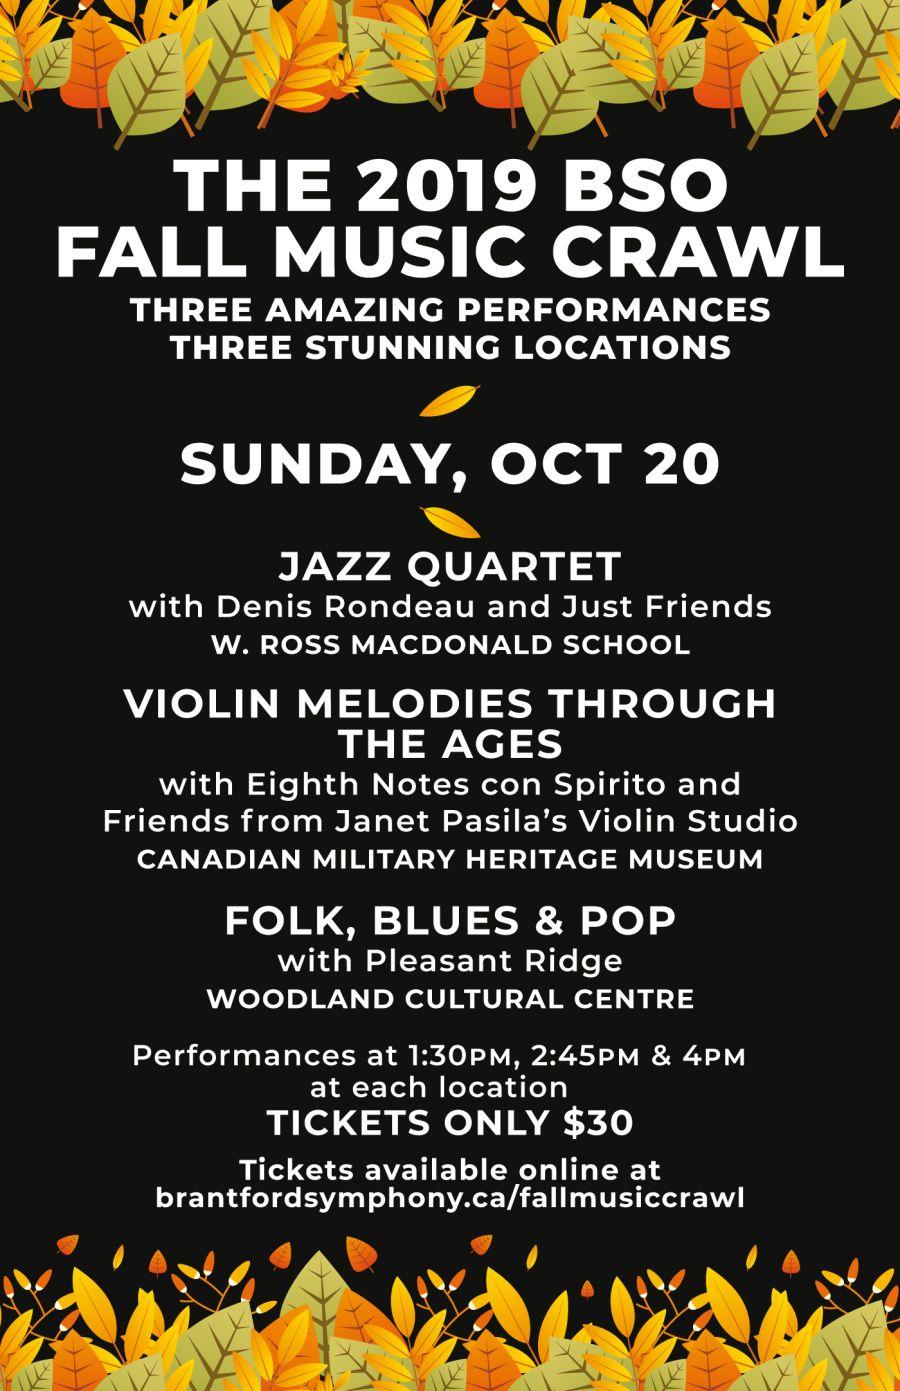 Fall Music Crawl poster